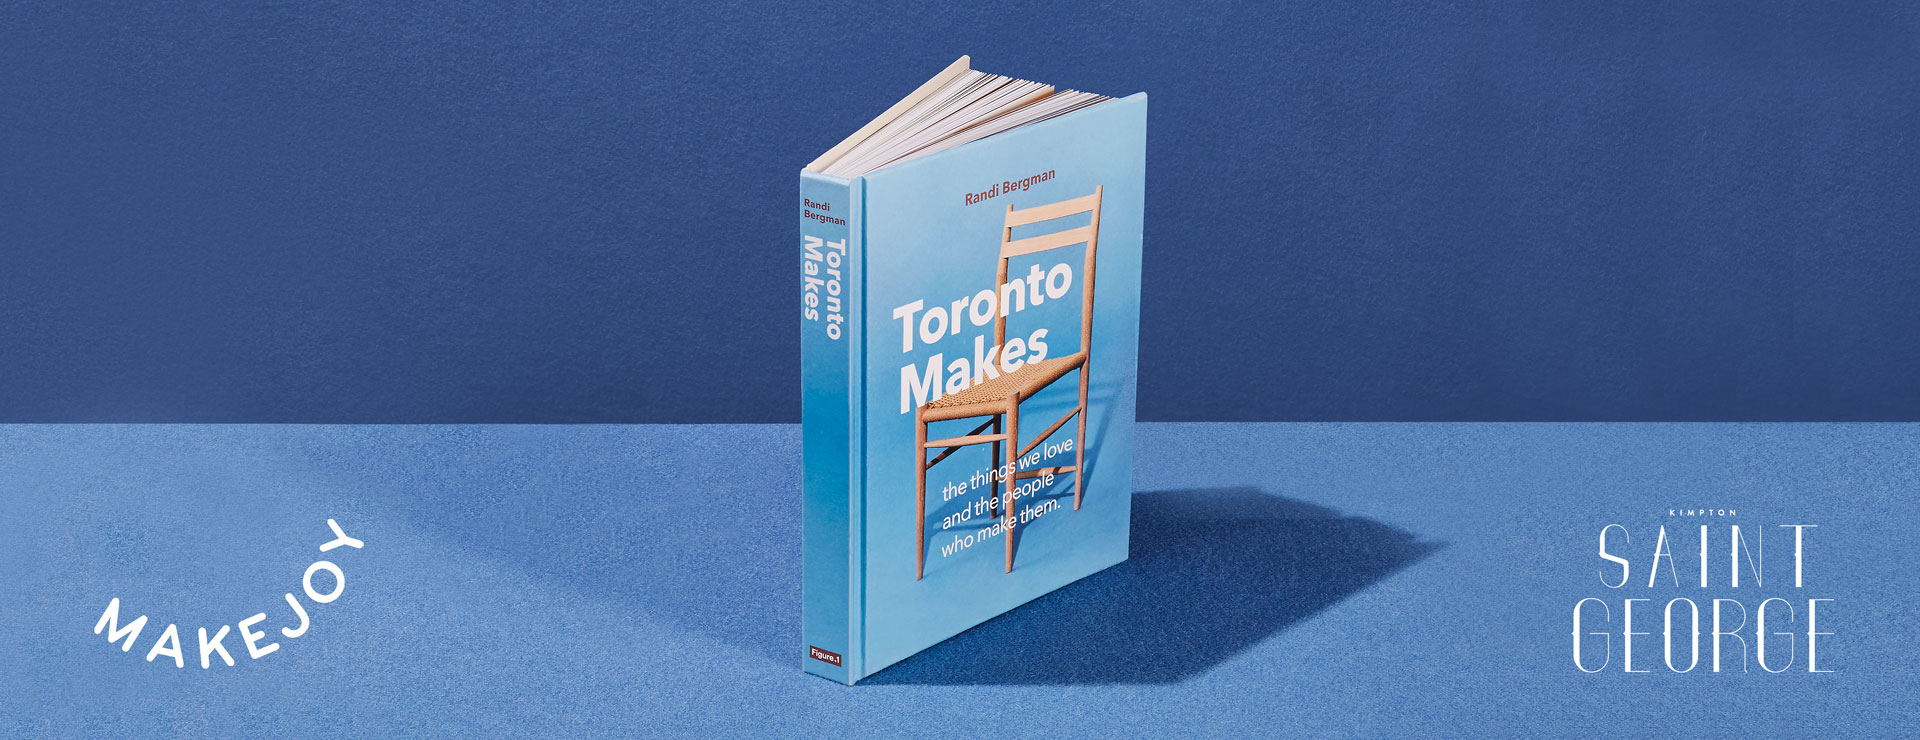 Toronto Makes Panel